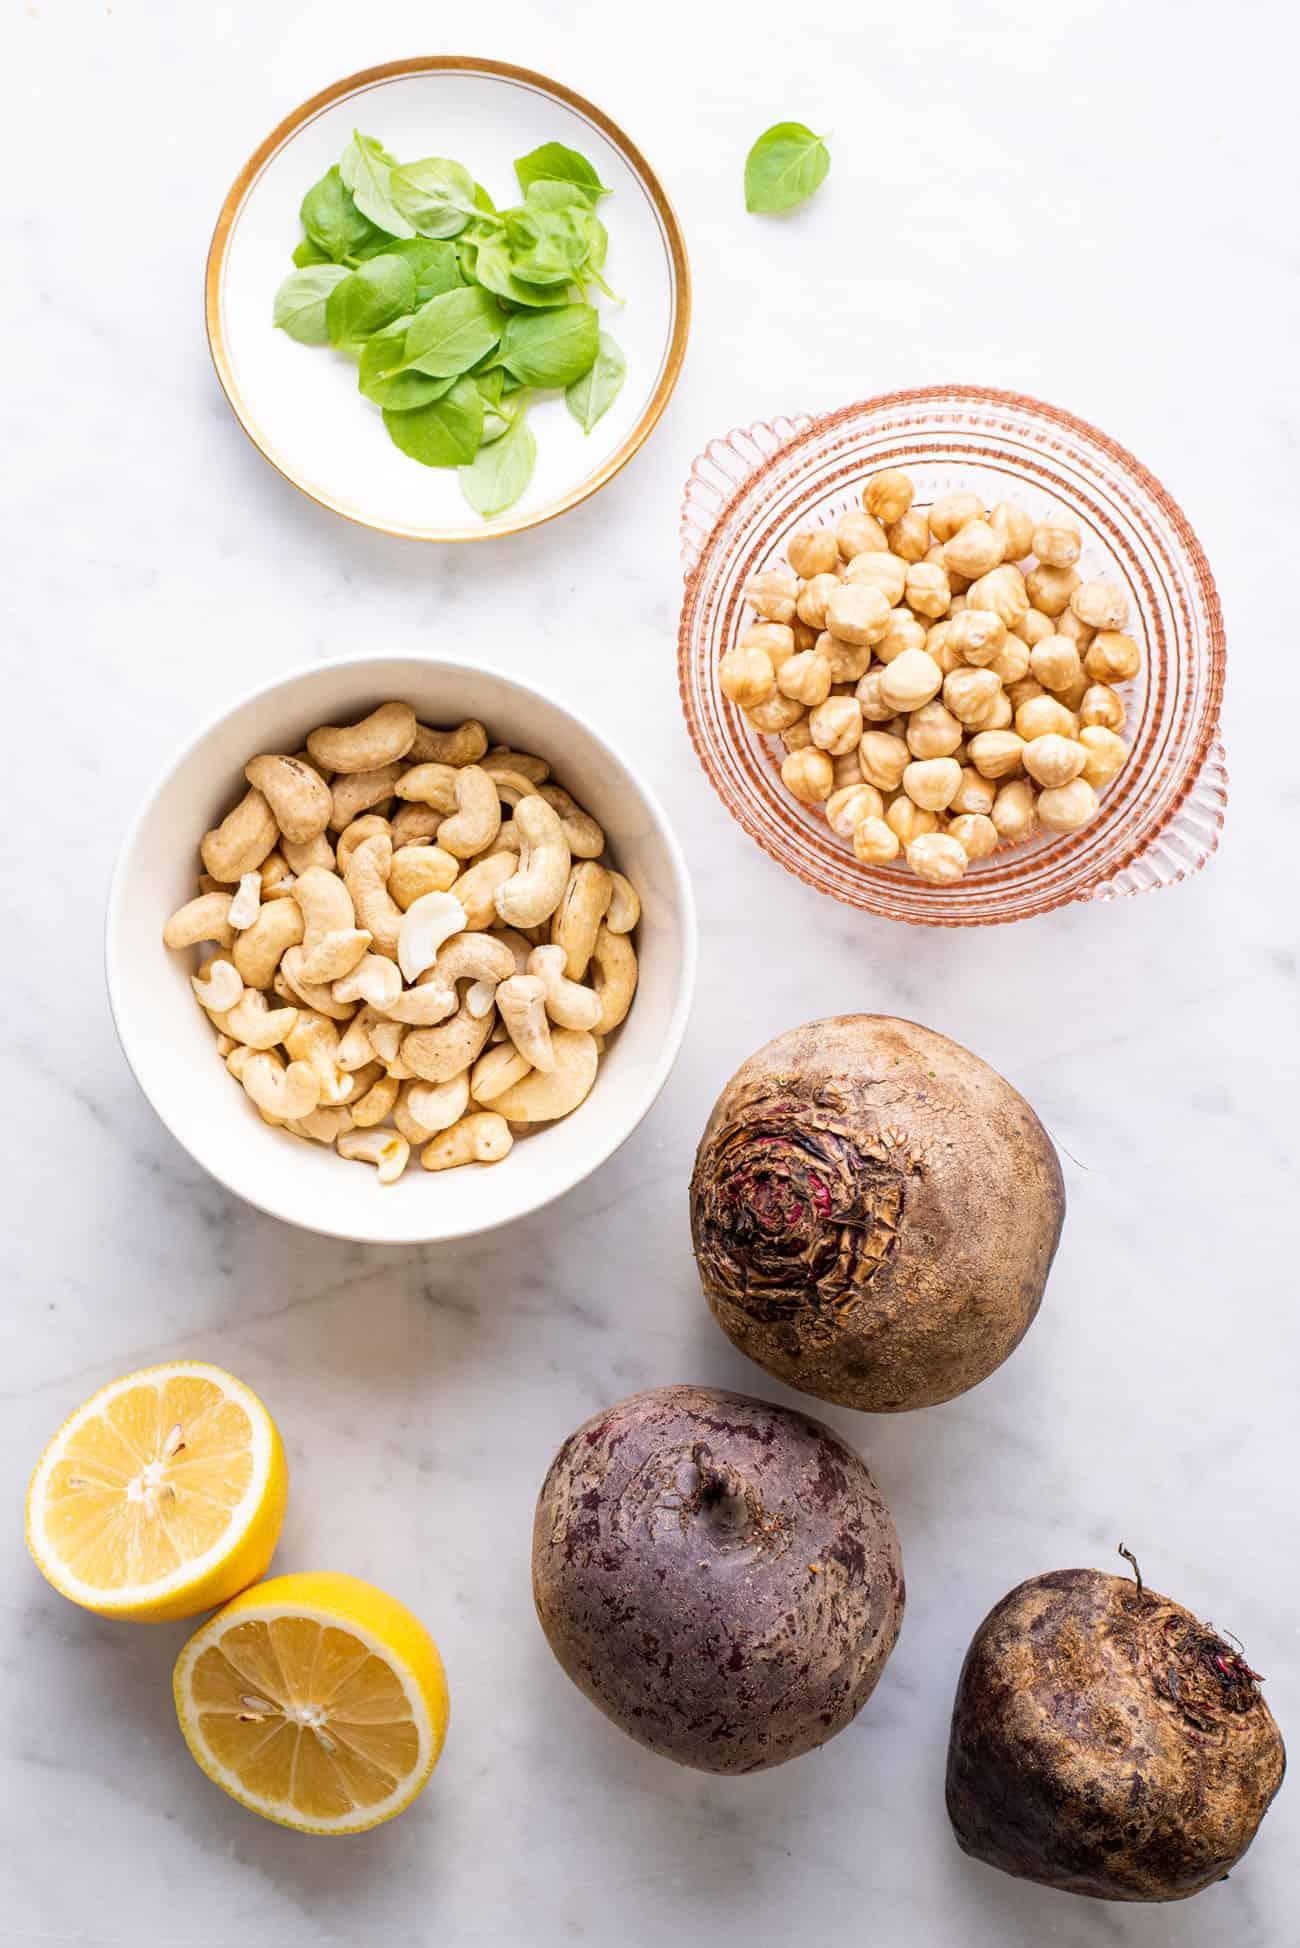 Basil, cashews, hazelnuts, lemon, and beets, gathered on a marble table